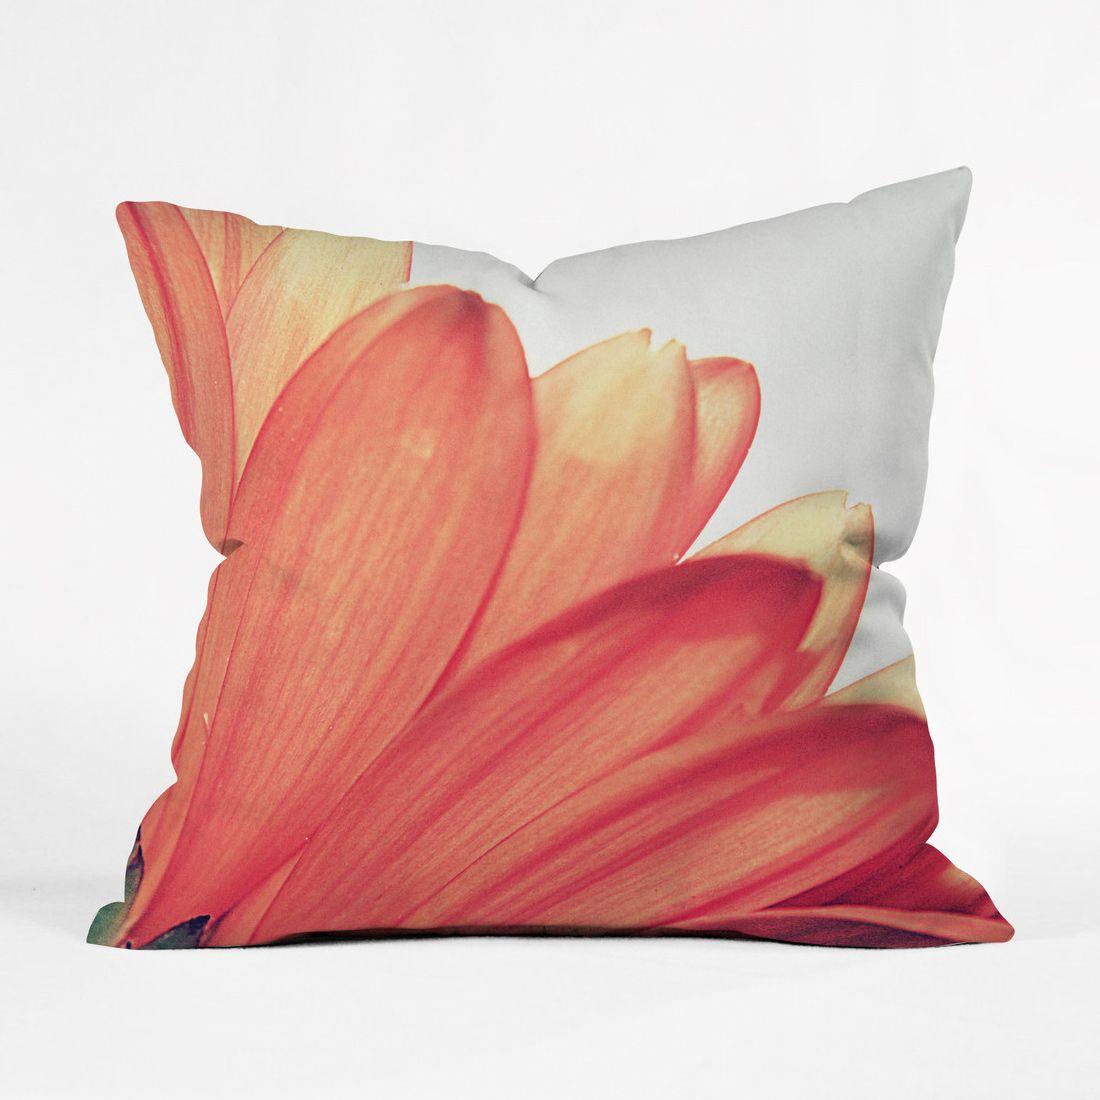 26 Round Floor Pillow Kess InHouse Iris Lehnhardt You are My Sunshine Pink Orange